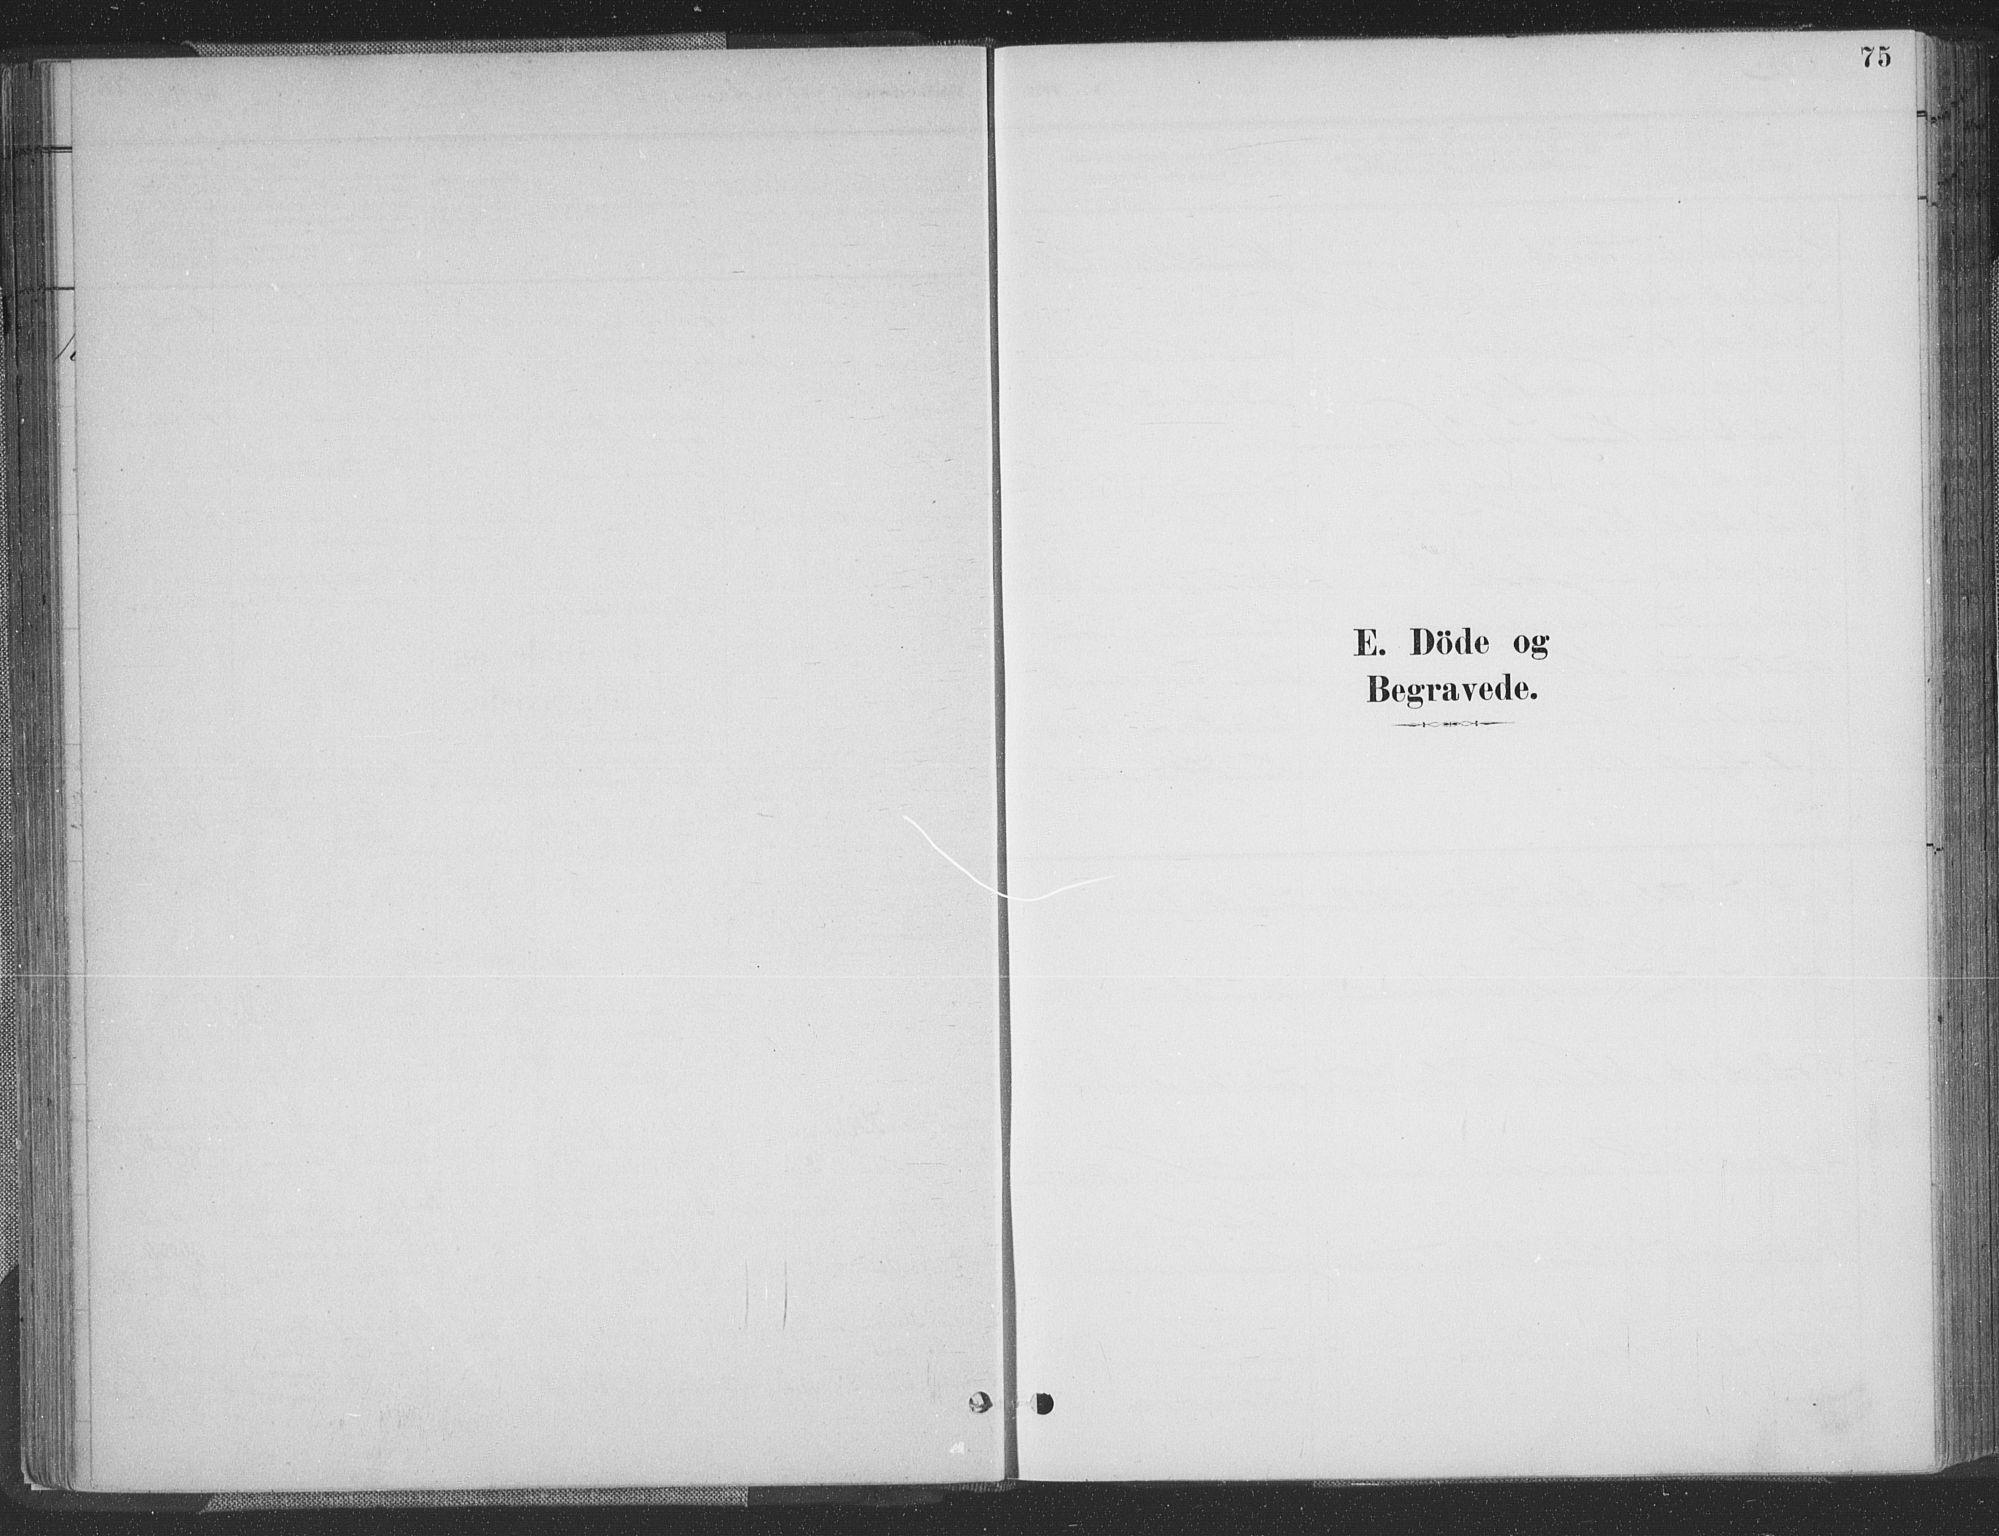 SAK, Grimstad sokneprestkontor, F/Fa/L0004: Ministerialbok nr. A 3, 1882-1910, s. 75